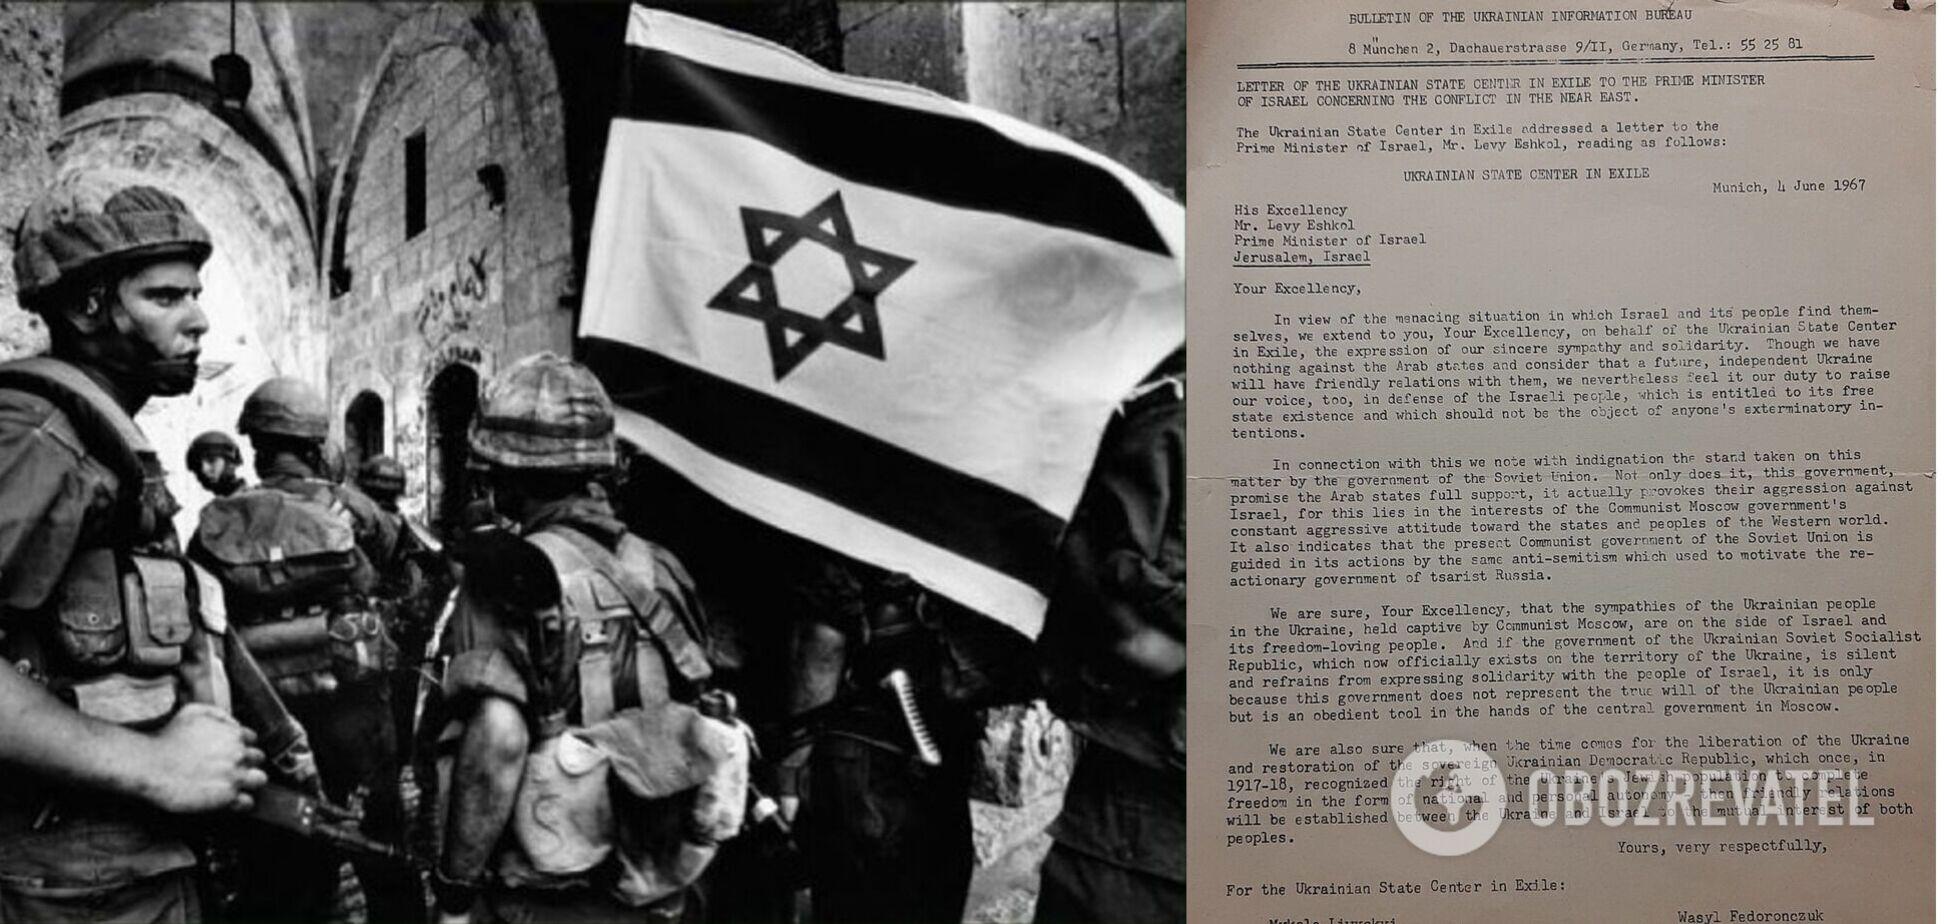 Документ датирован 1967 годом